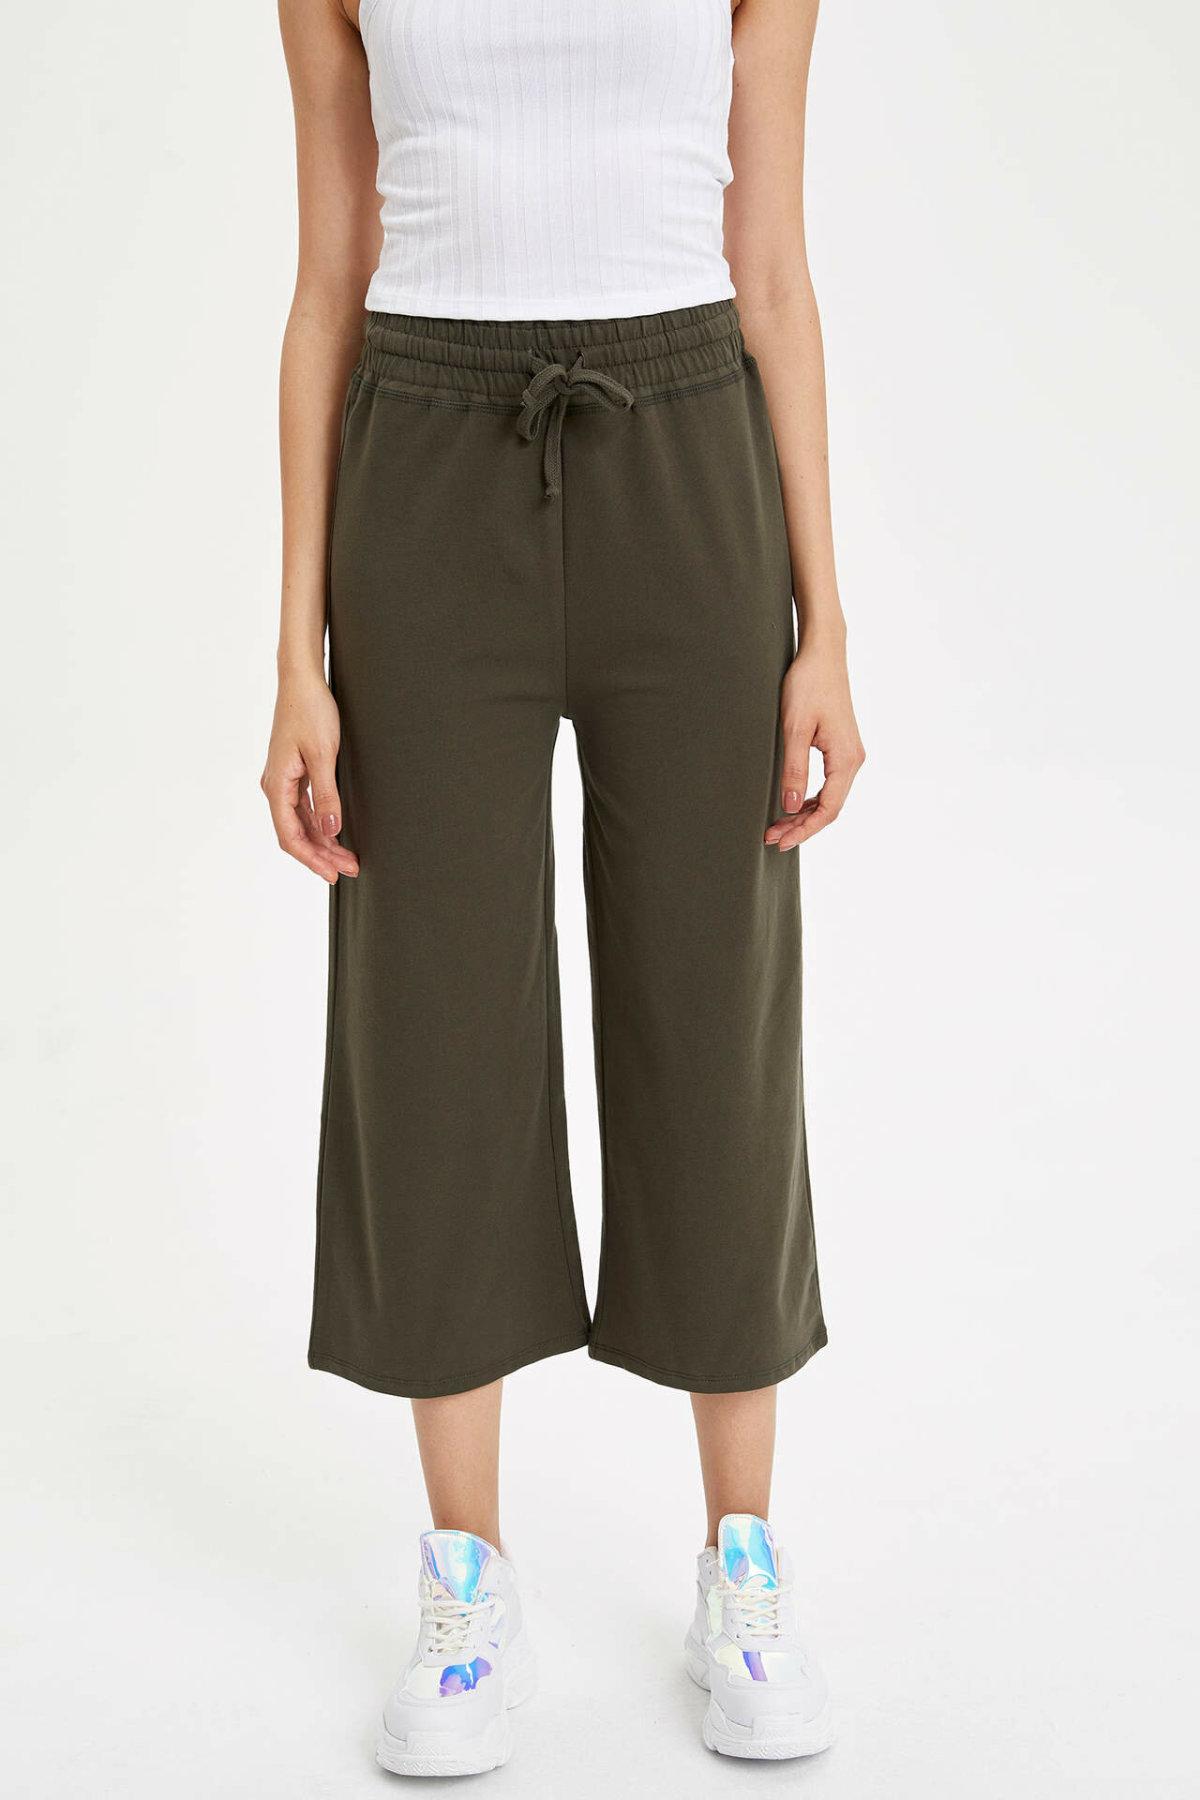 Women Summer Thin Knit Trousers Wide Leg Loose Pants Ankle Length Pants Casual Trouser Elastic Waist Pants K8592AZ19SM